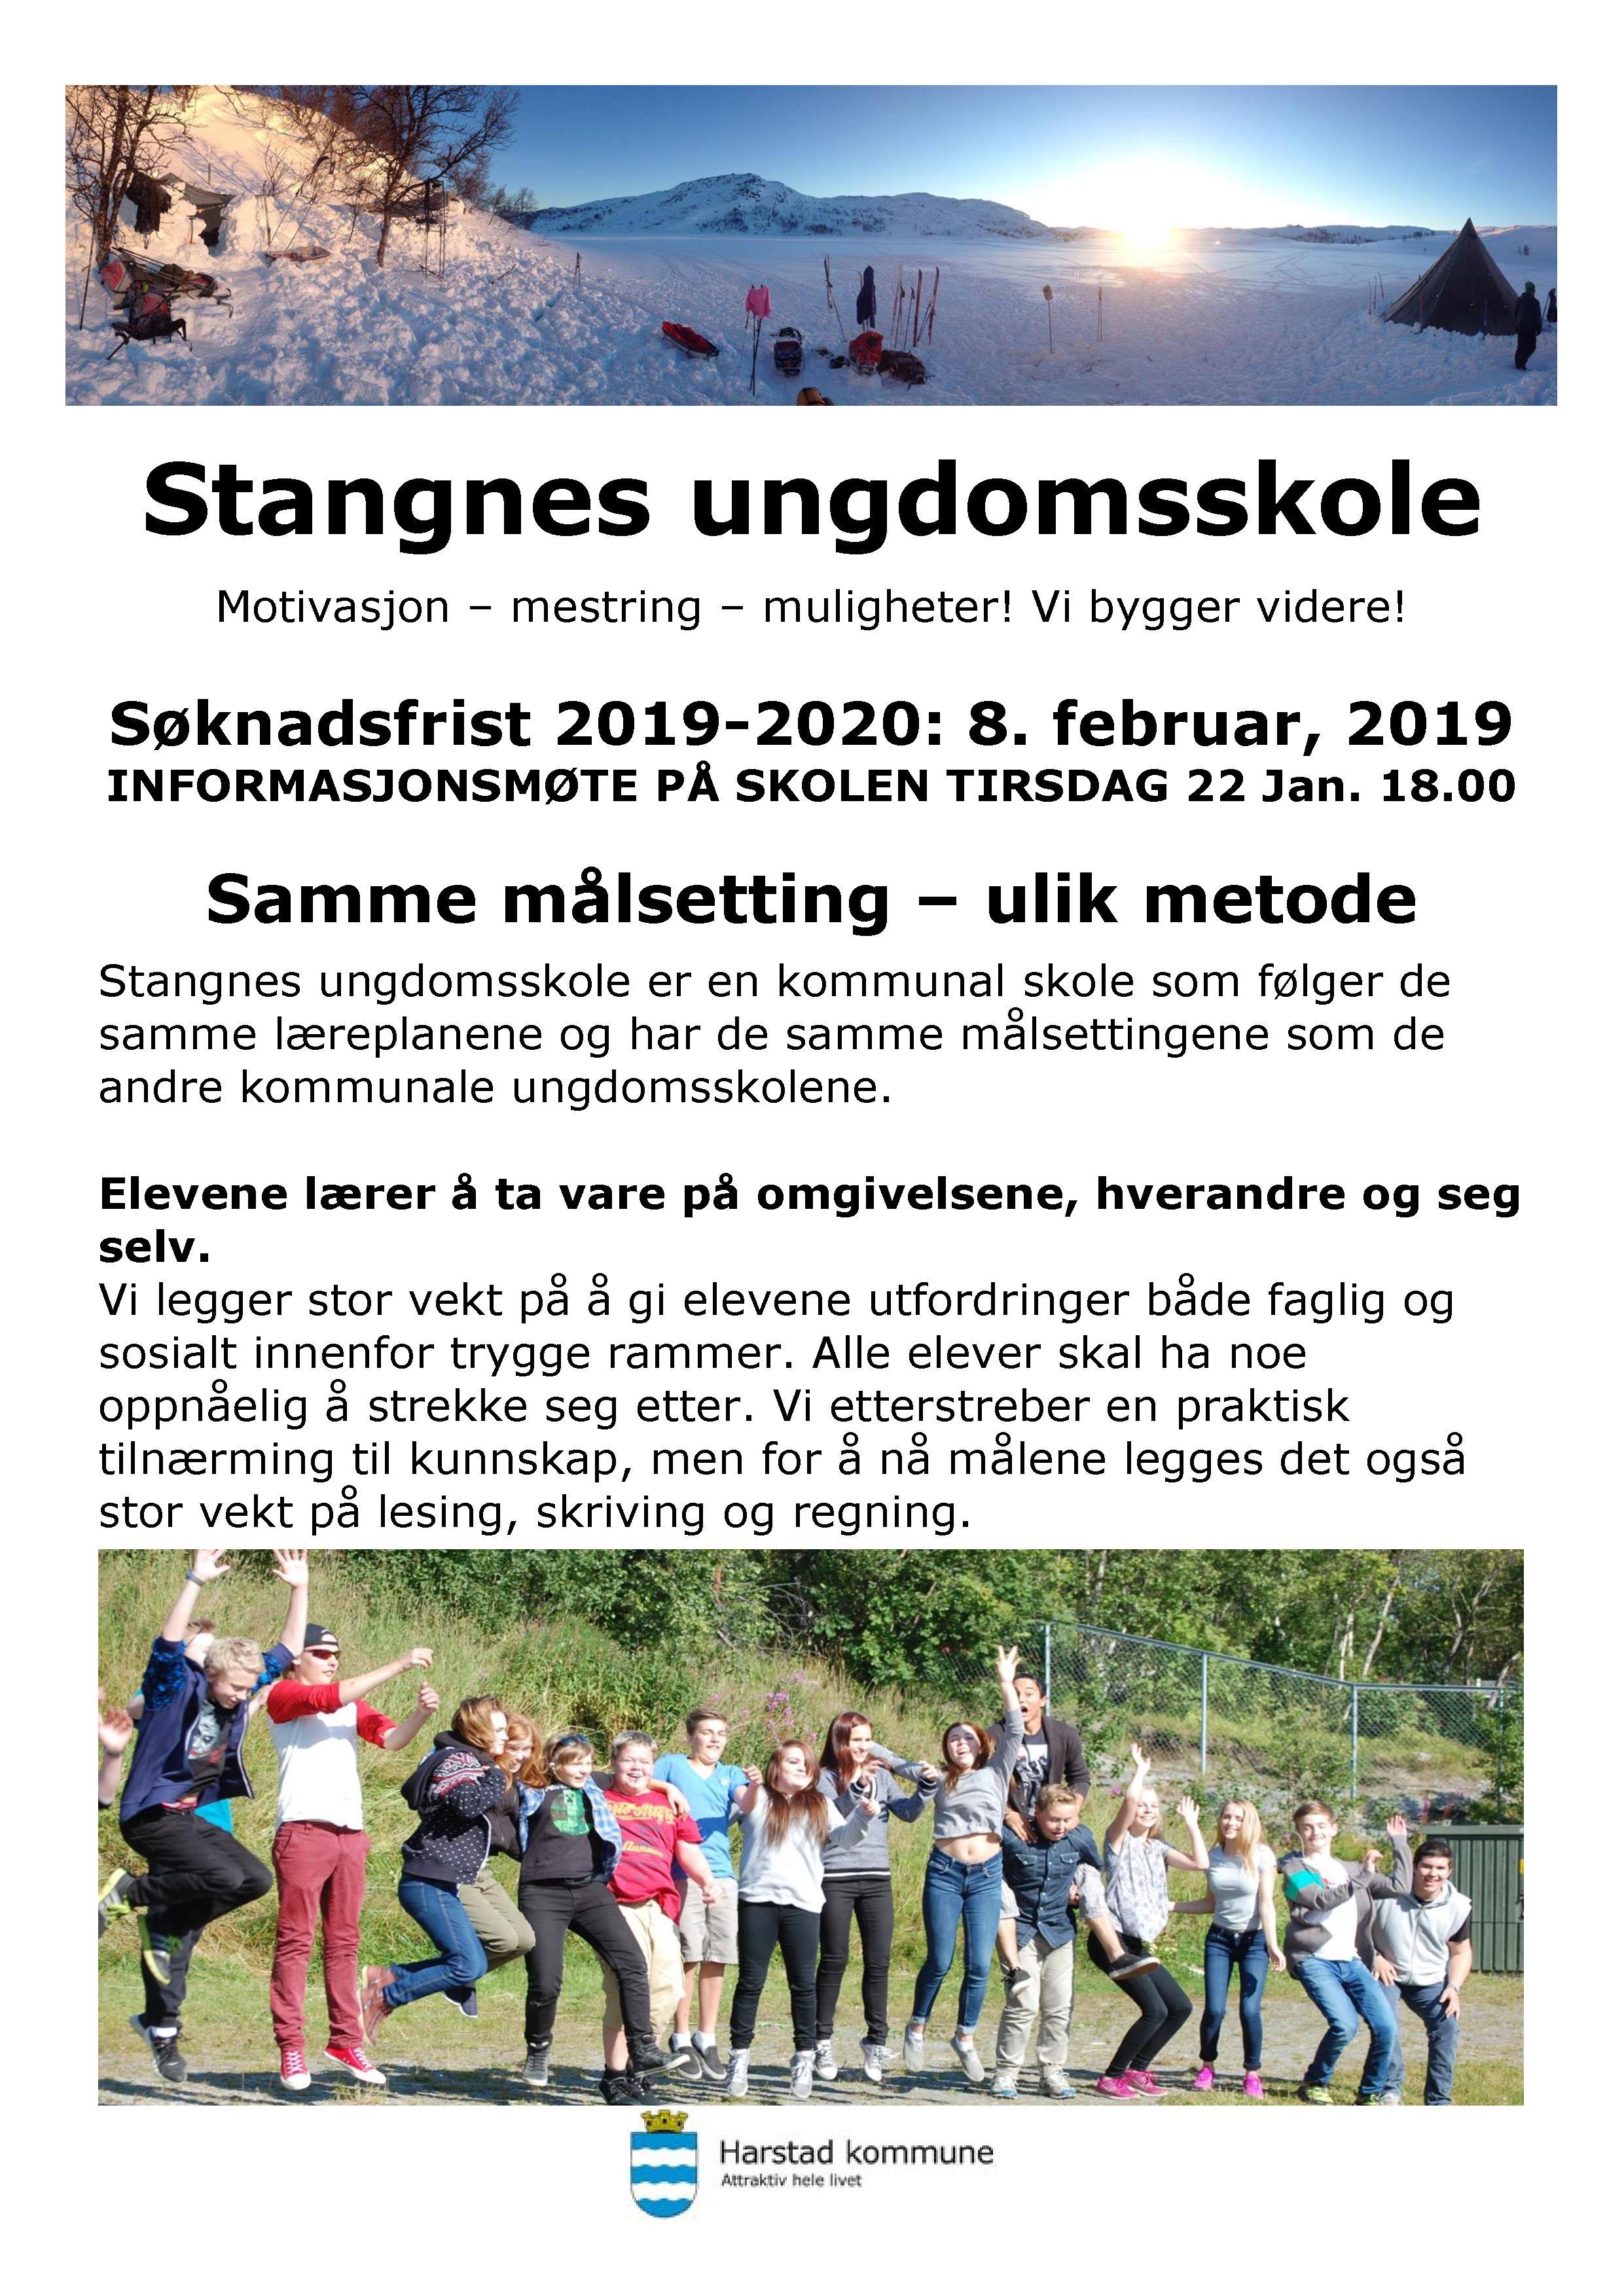 En side promo - Stangnes ungdomsskole 2019-20.jpg